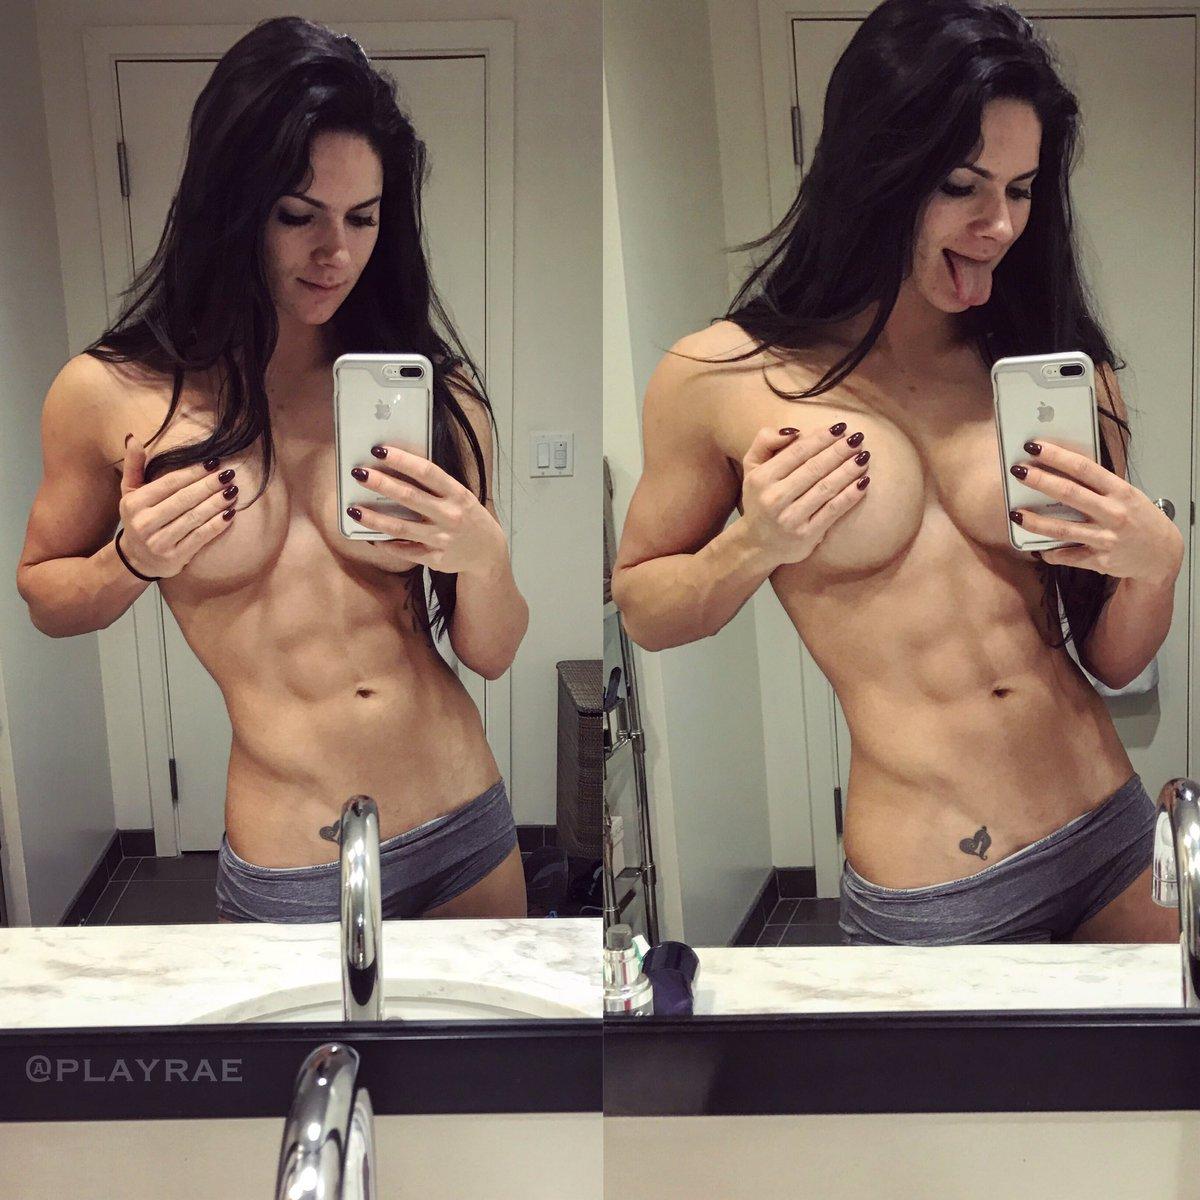 Gym girl selfie naked